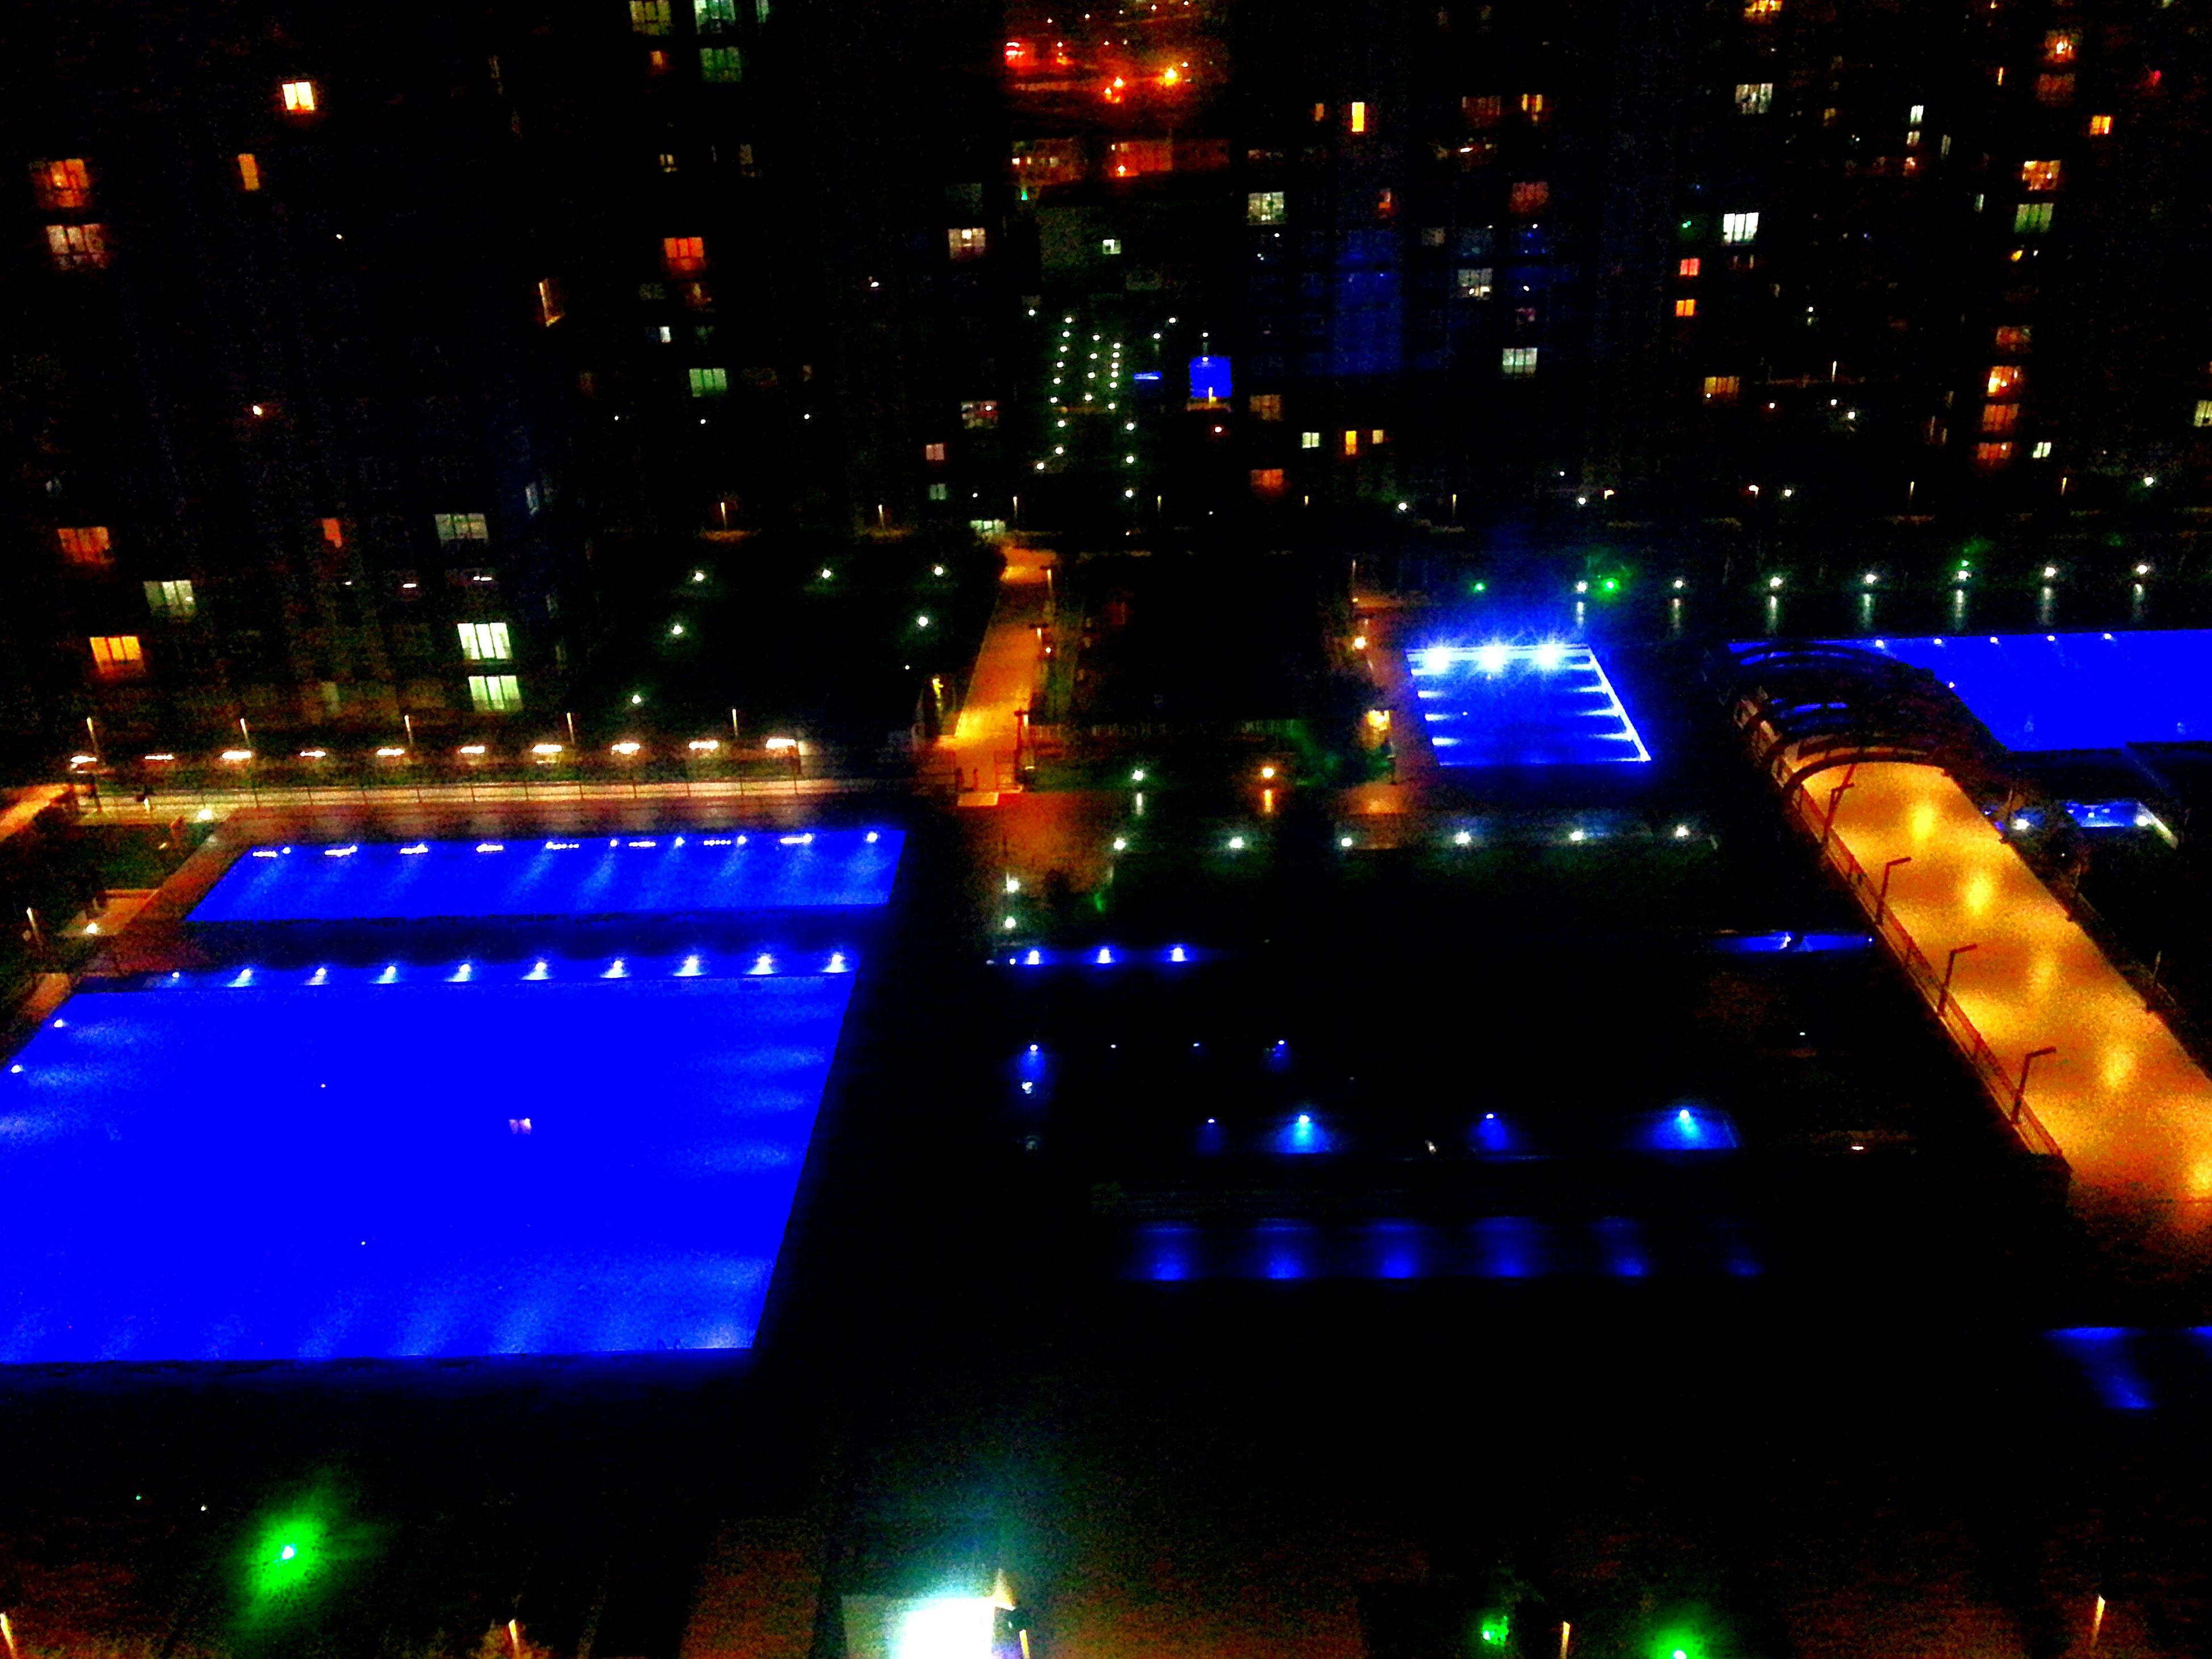 night, illuminated, no people, outdoors